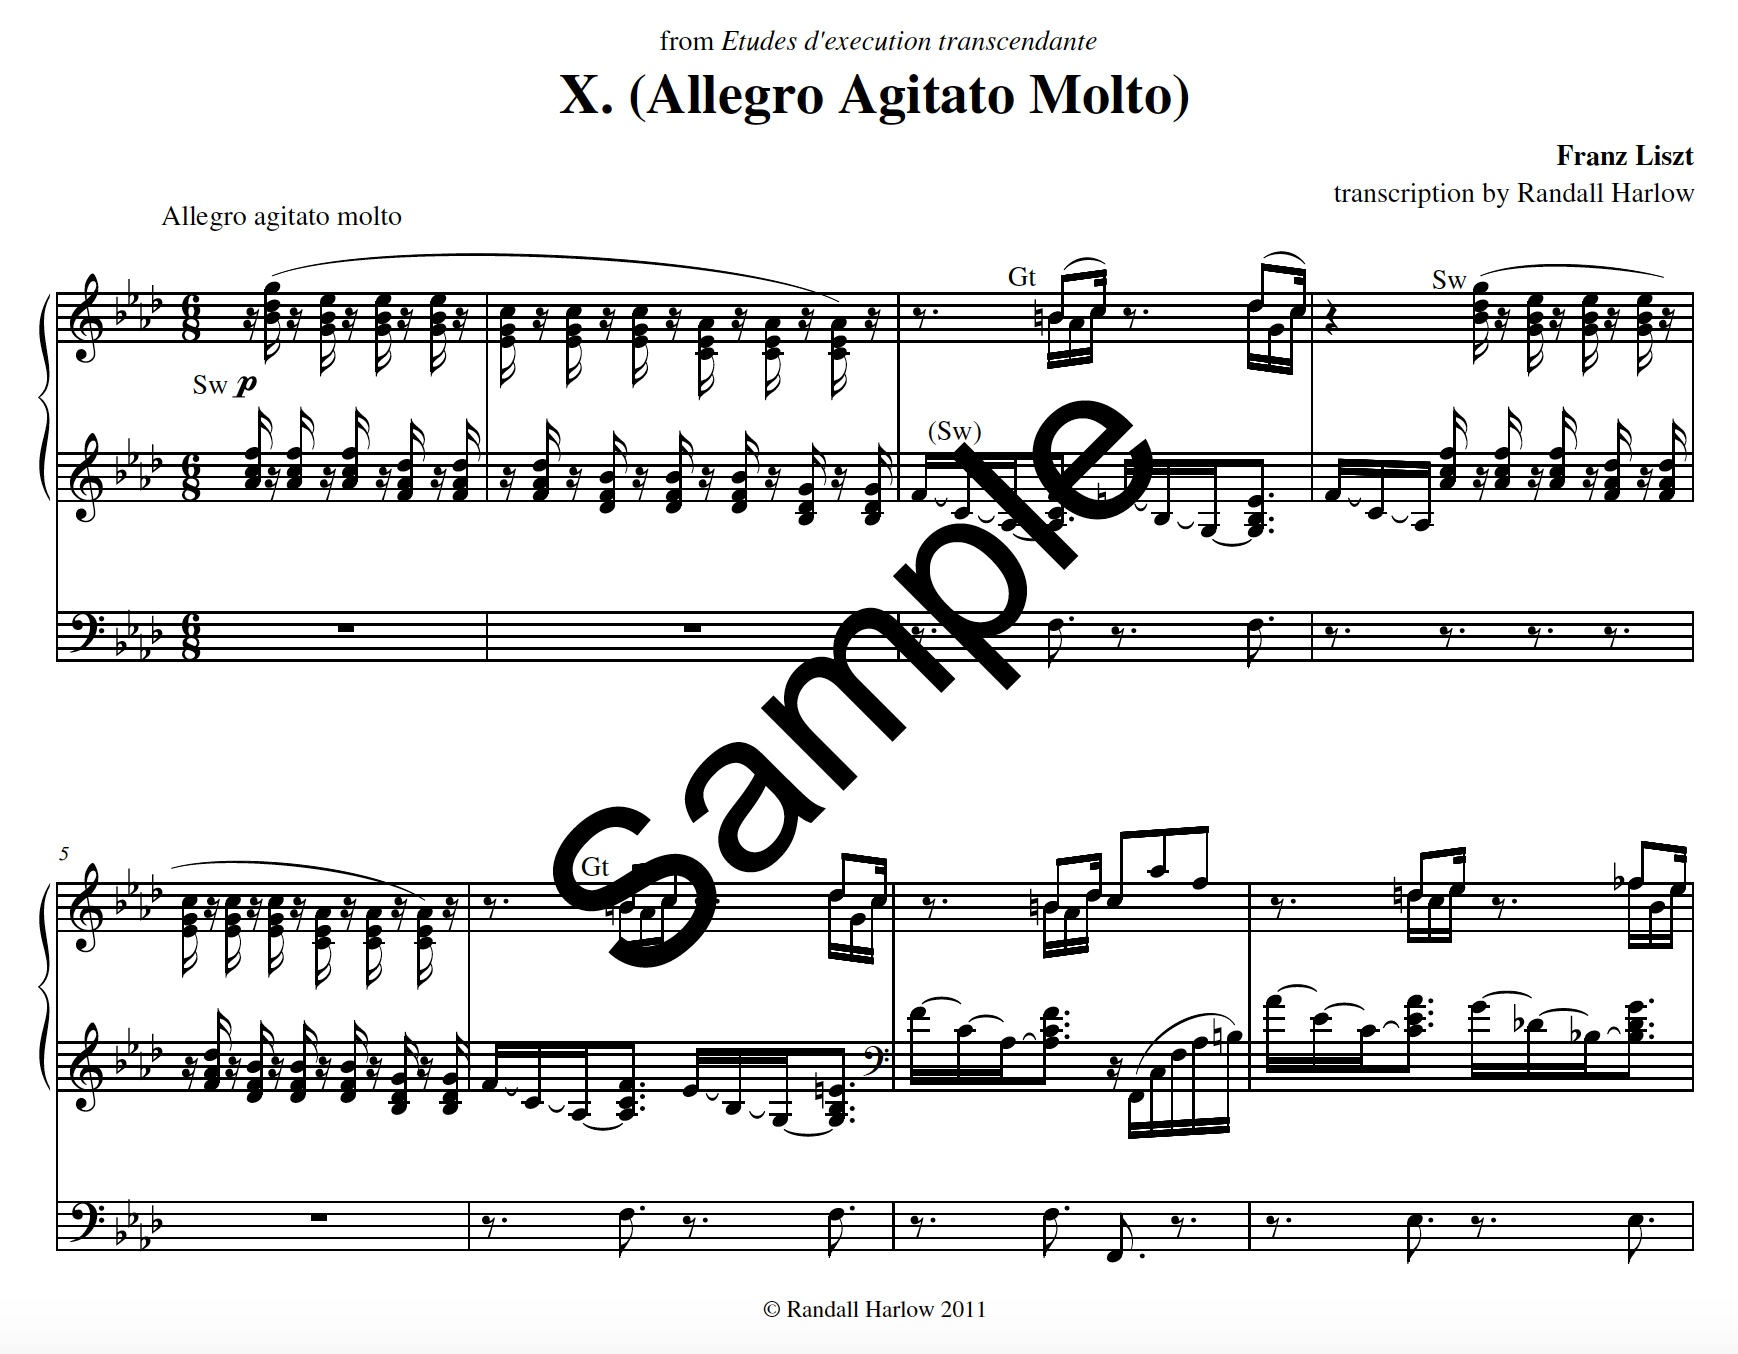 Liszt Transcendental Etudes Allegro Agitato transcribed for organ